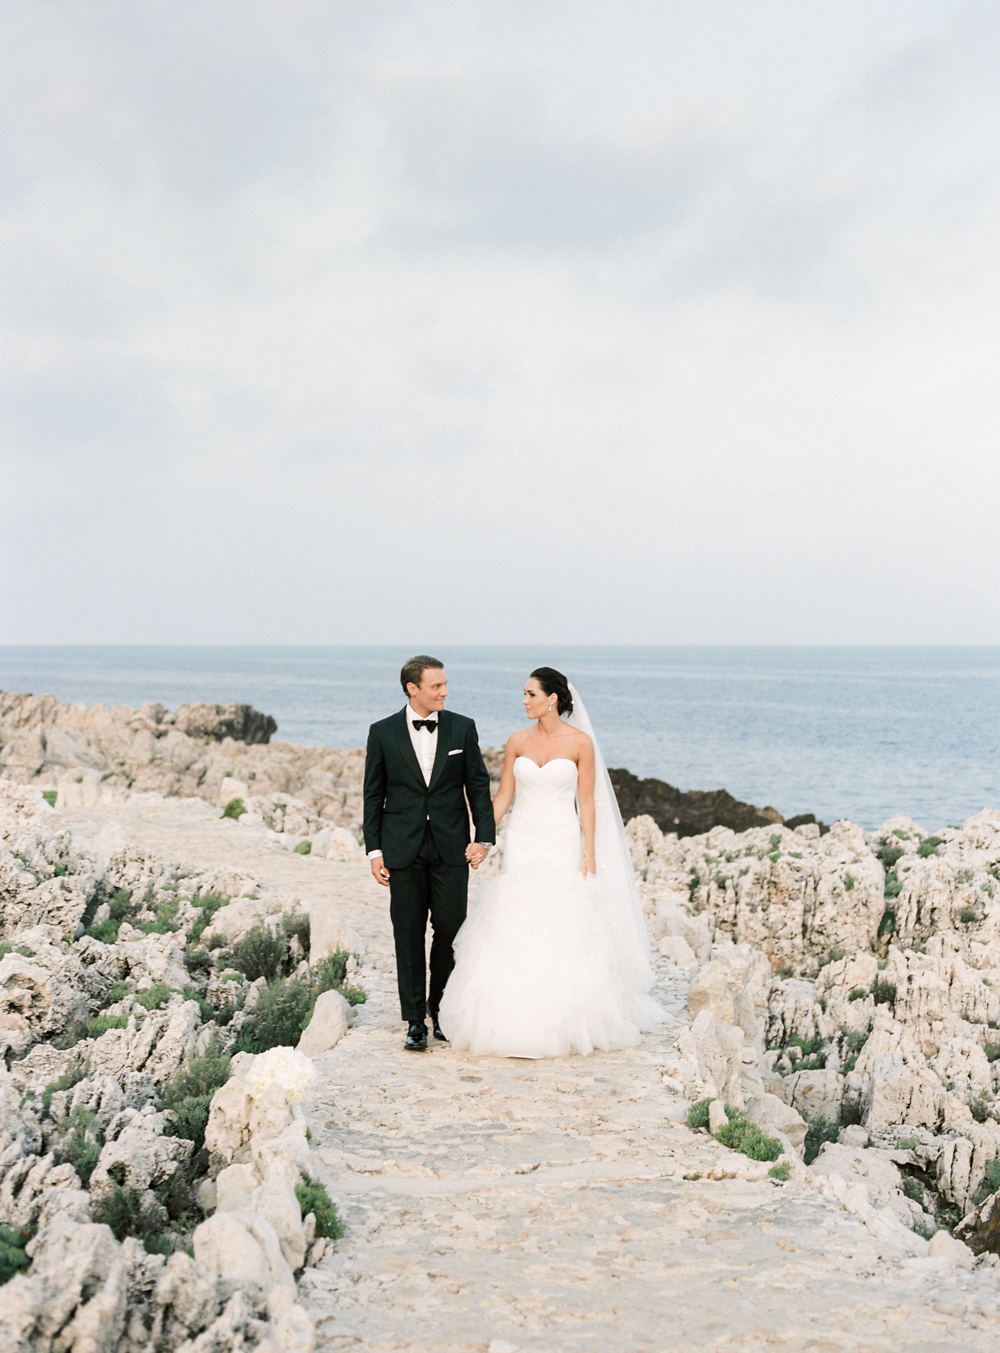 French-Riviera-Wedding-(c)-Rory-Wylie-86.jpg